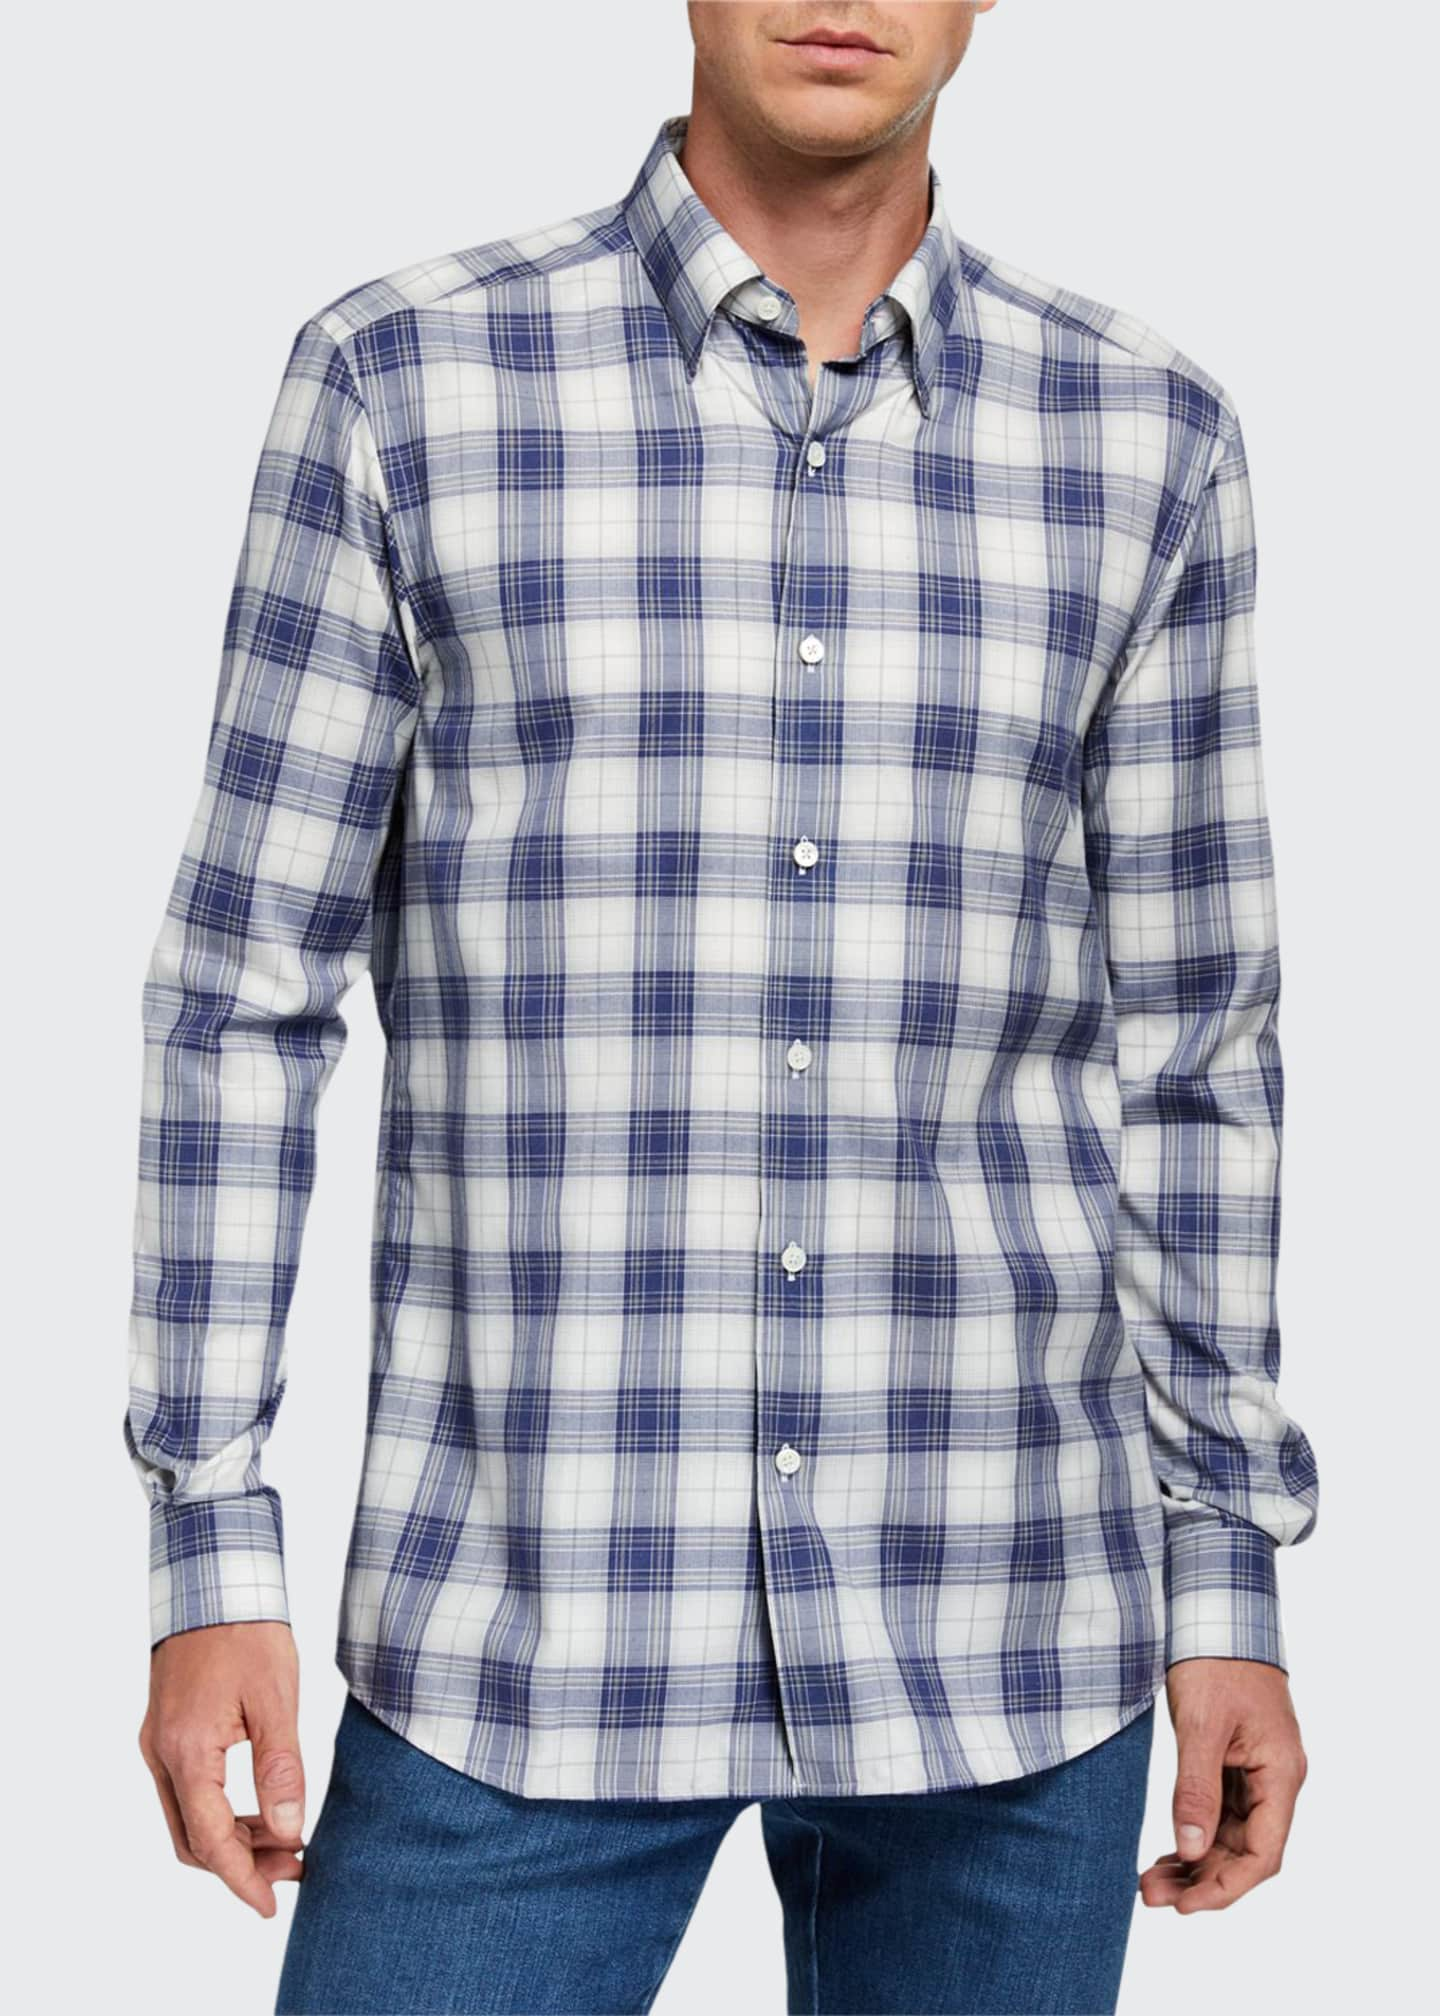 Ermenegildo Zegna Men's Large Plaid Sport Shirt